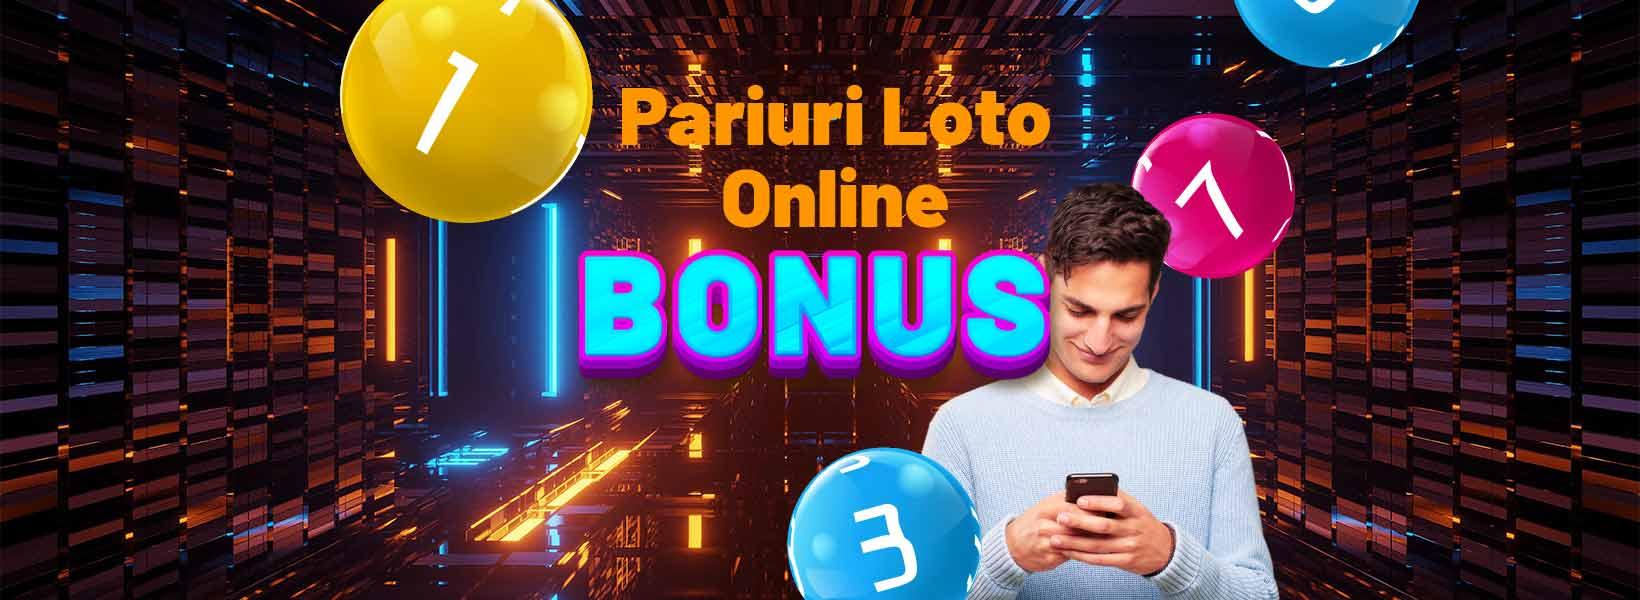 loto online